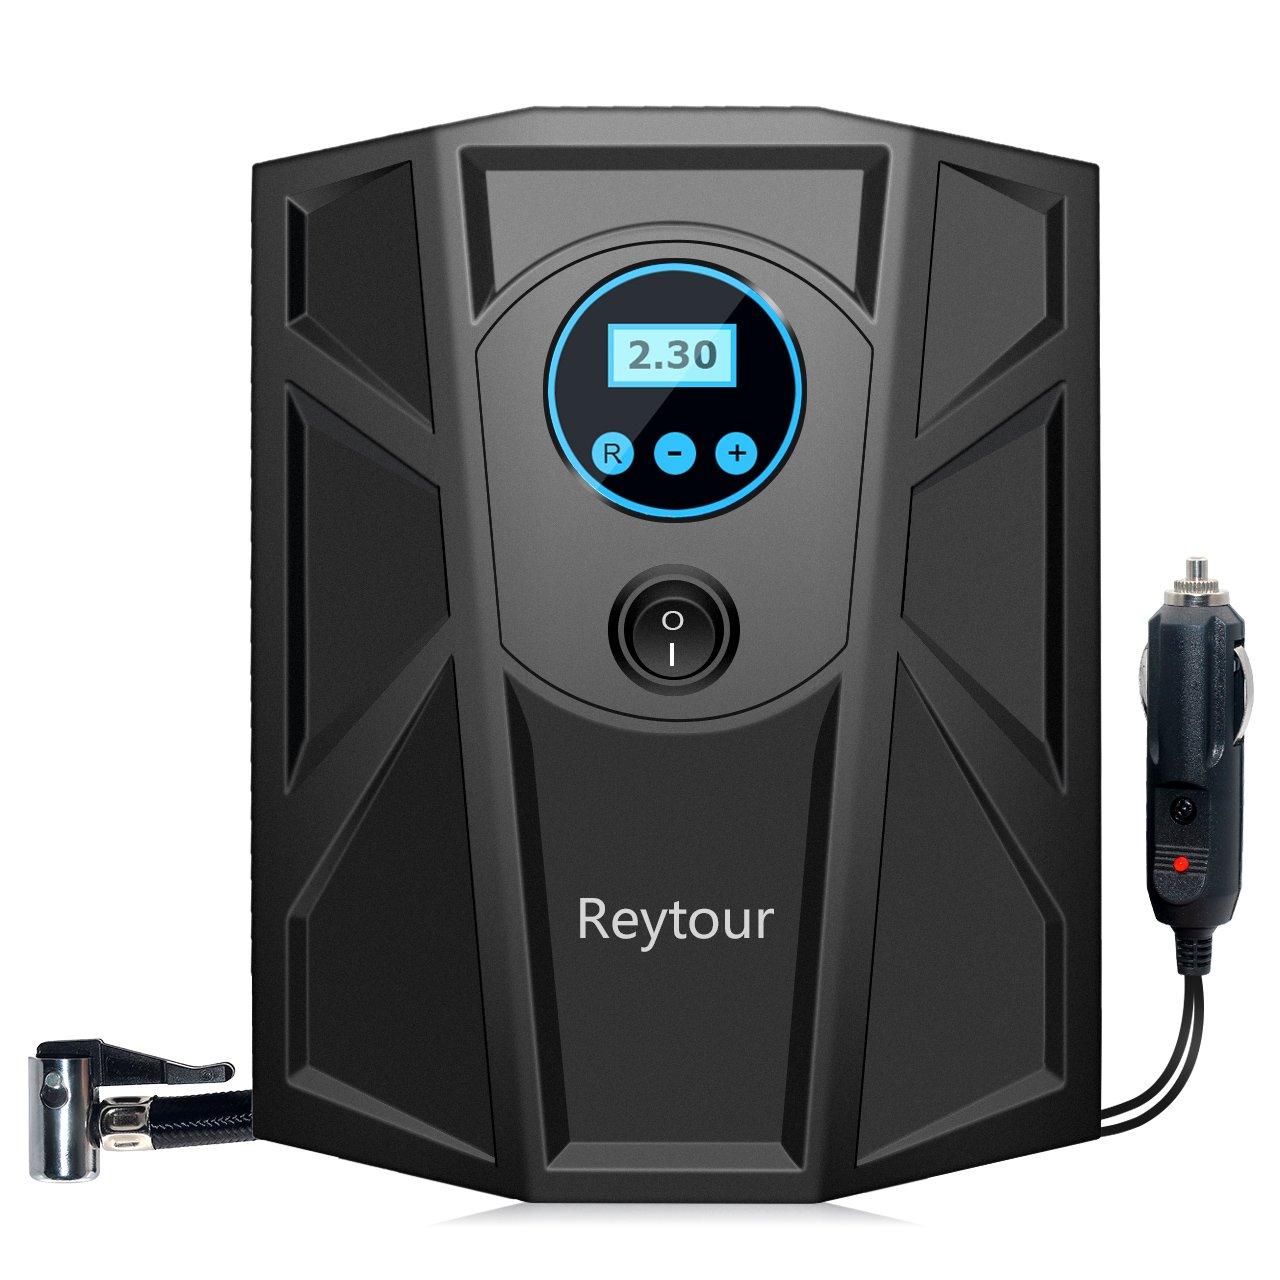 Tire Inflator, Digital 12V Portable Auto Air Compressor Pump, Preset Pressure, 100PSI for Vehicles, Tires Balls, Inflatable Objects